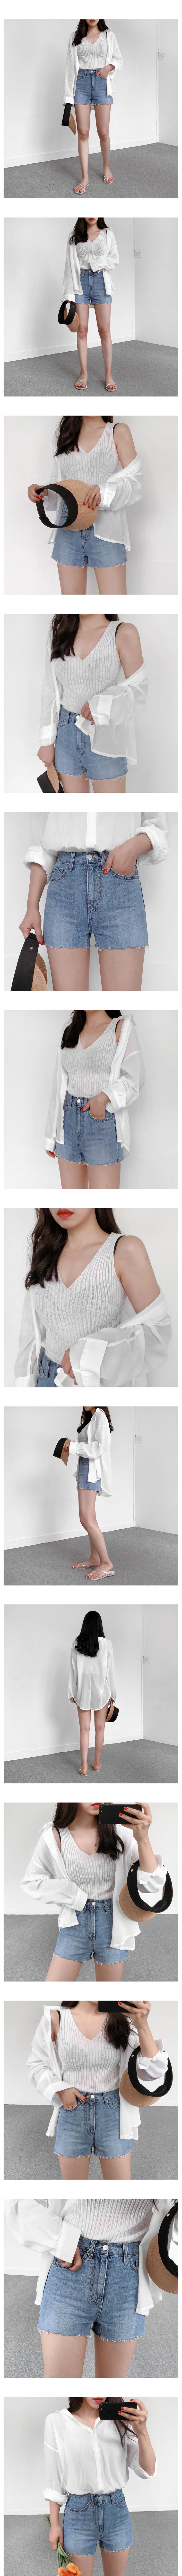 Loose mesh shirt